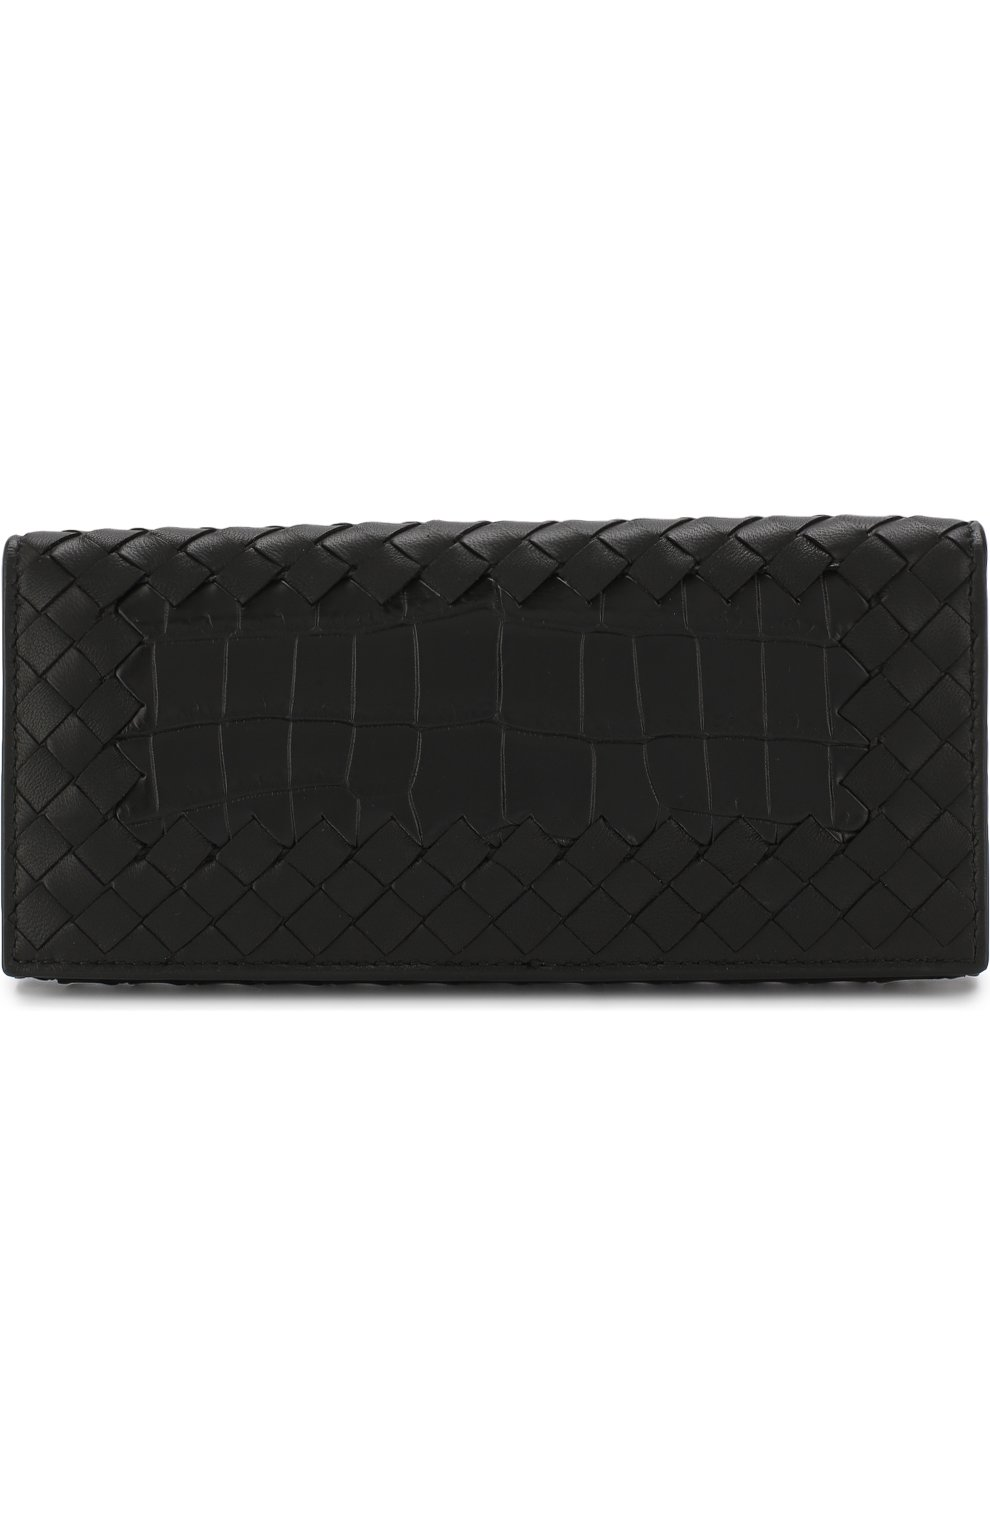 64c056411b18 Портмоне из кожи крокодила с плетением intrecciato Bottega Veneta черного  цвета | Фото №1